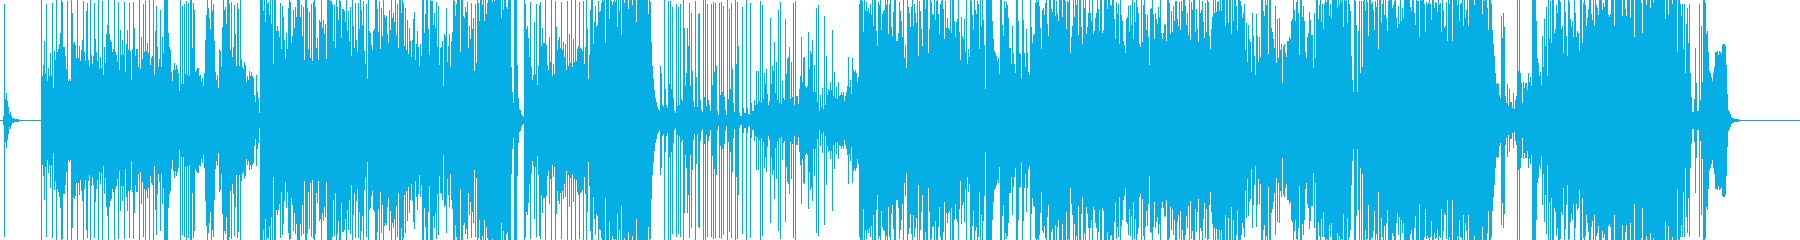 AZUMAの再生済みの波形